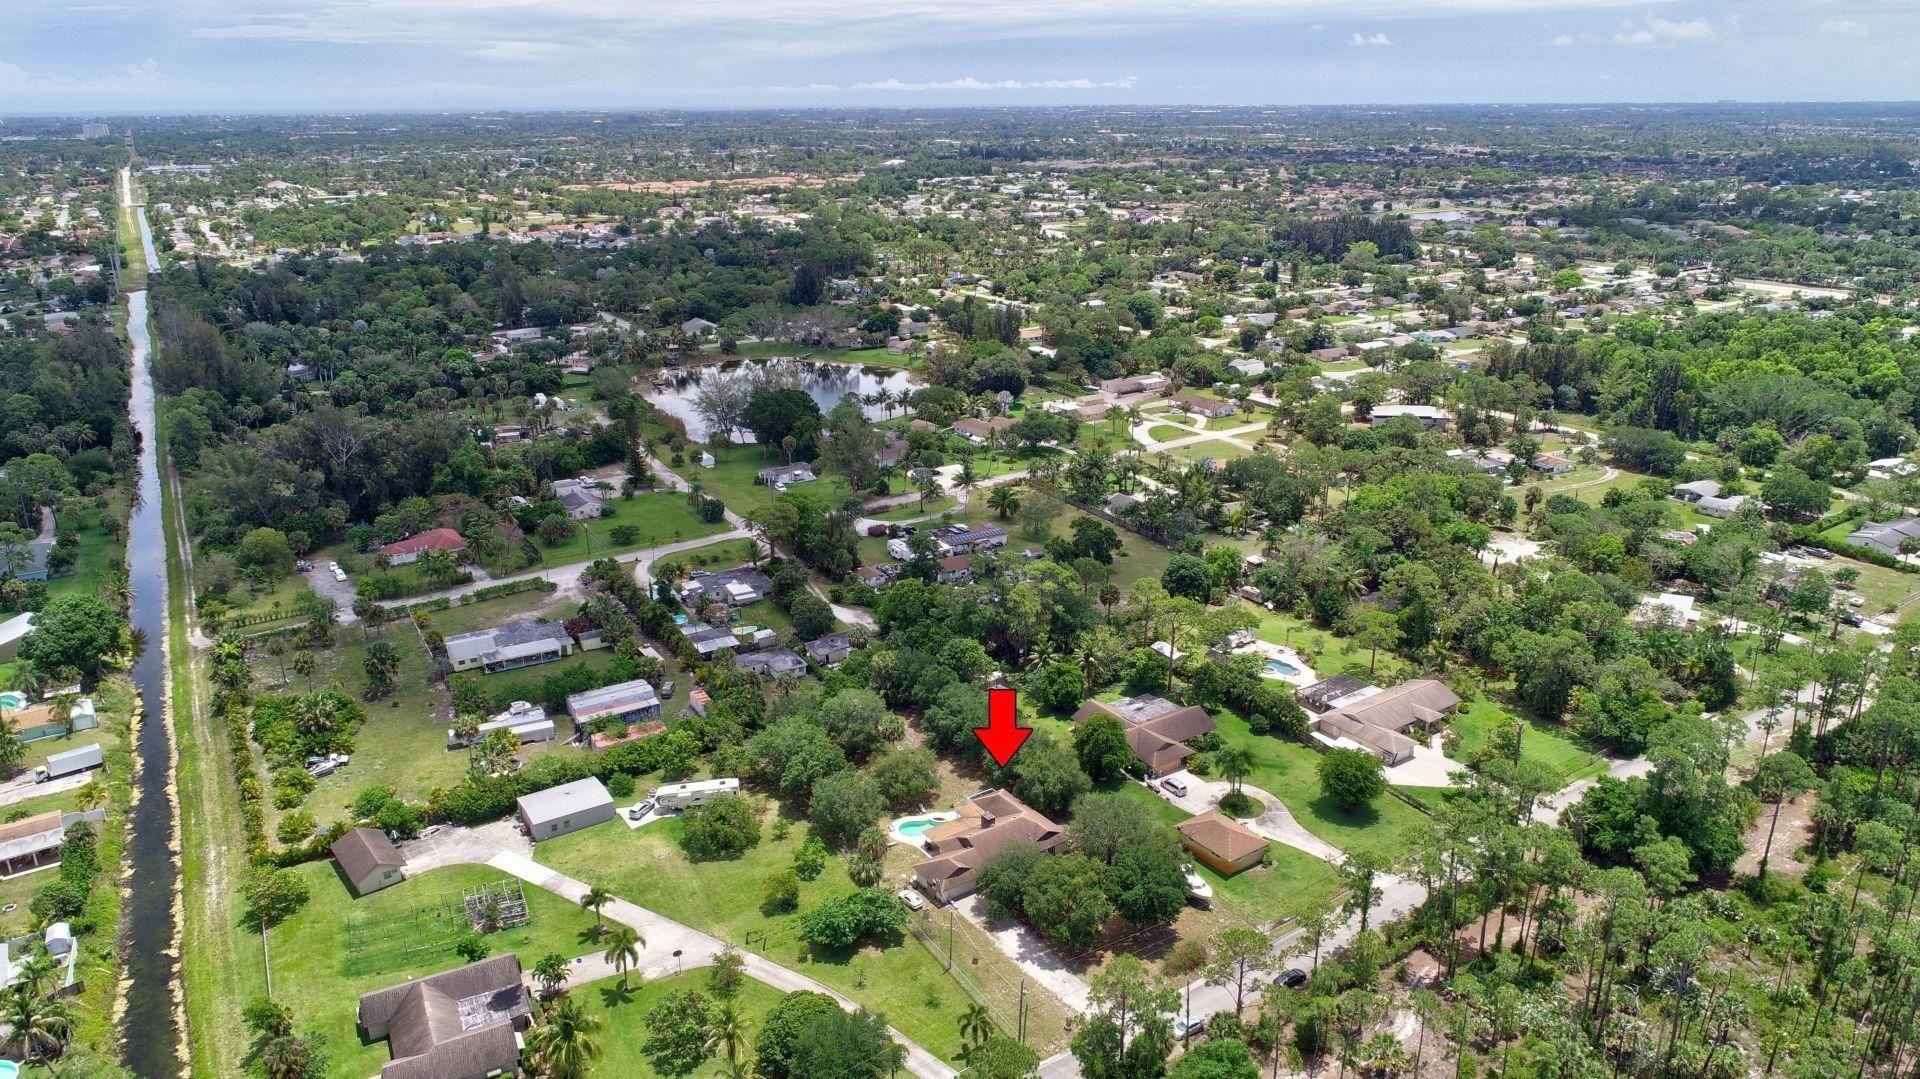 564 Fergusson Lane, West Palm Beach, FL 33415 - MLS#: RX-10704232